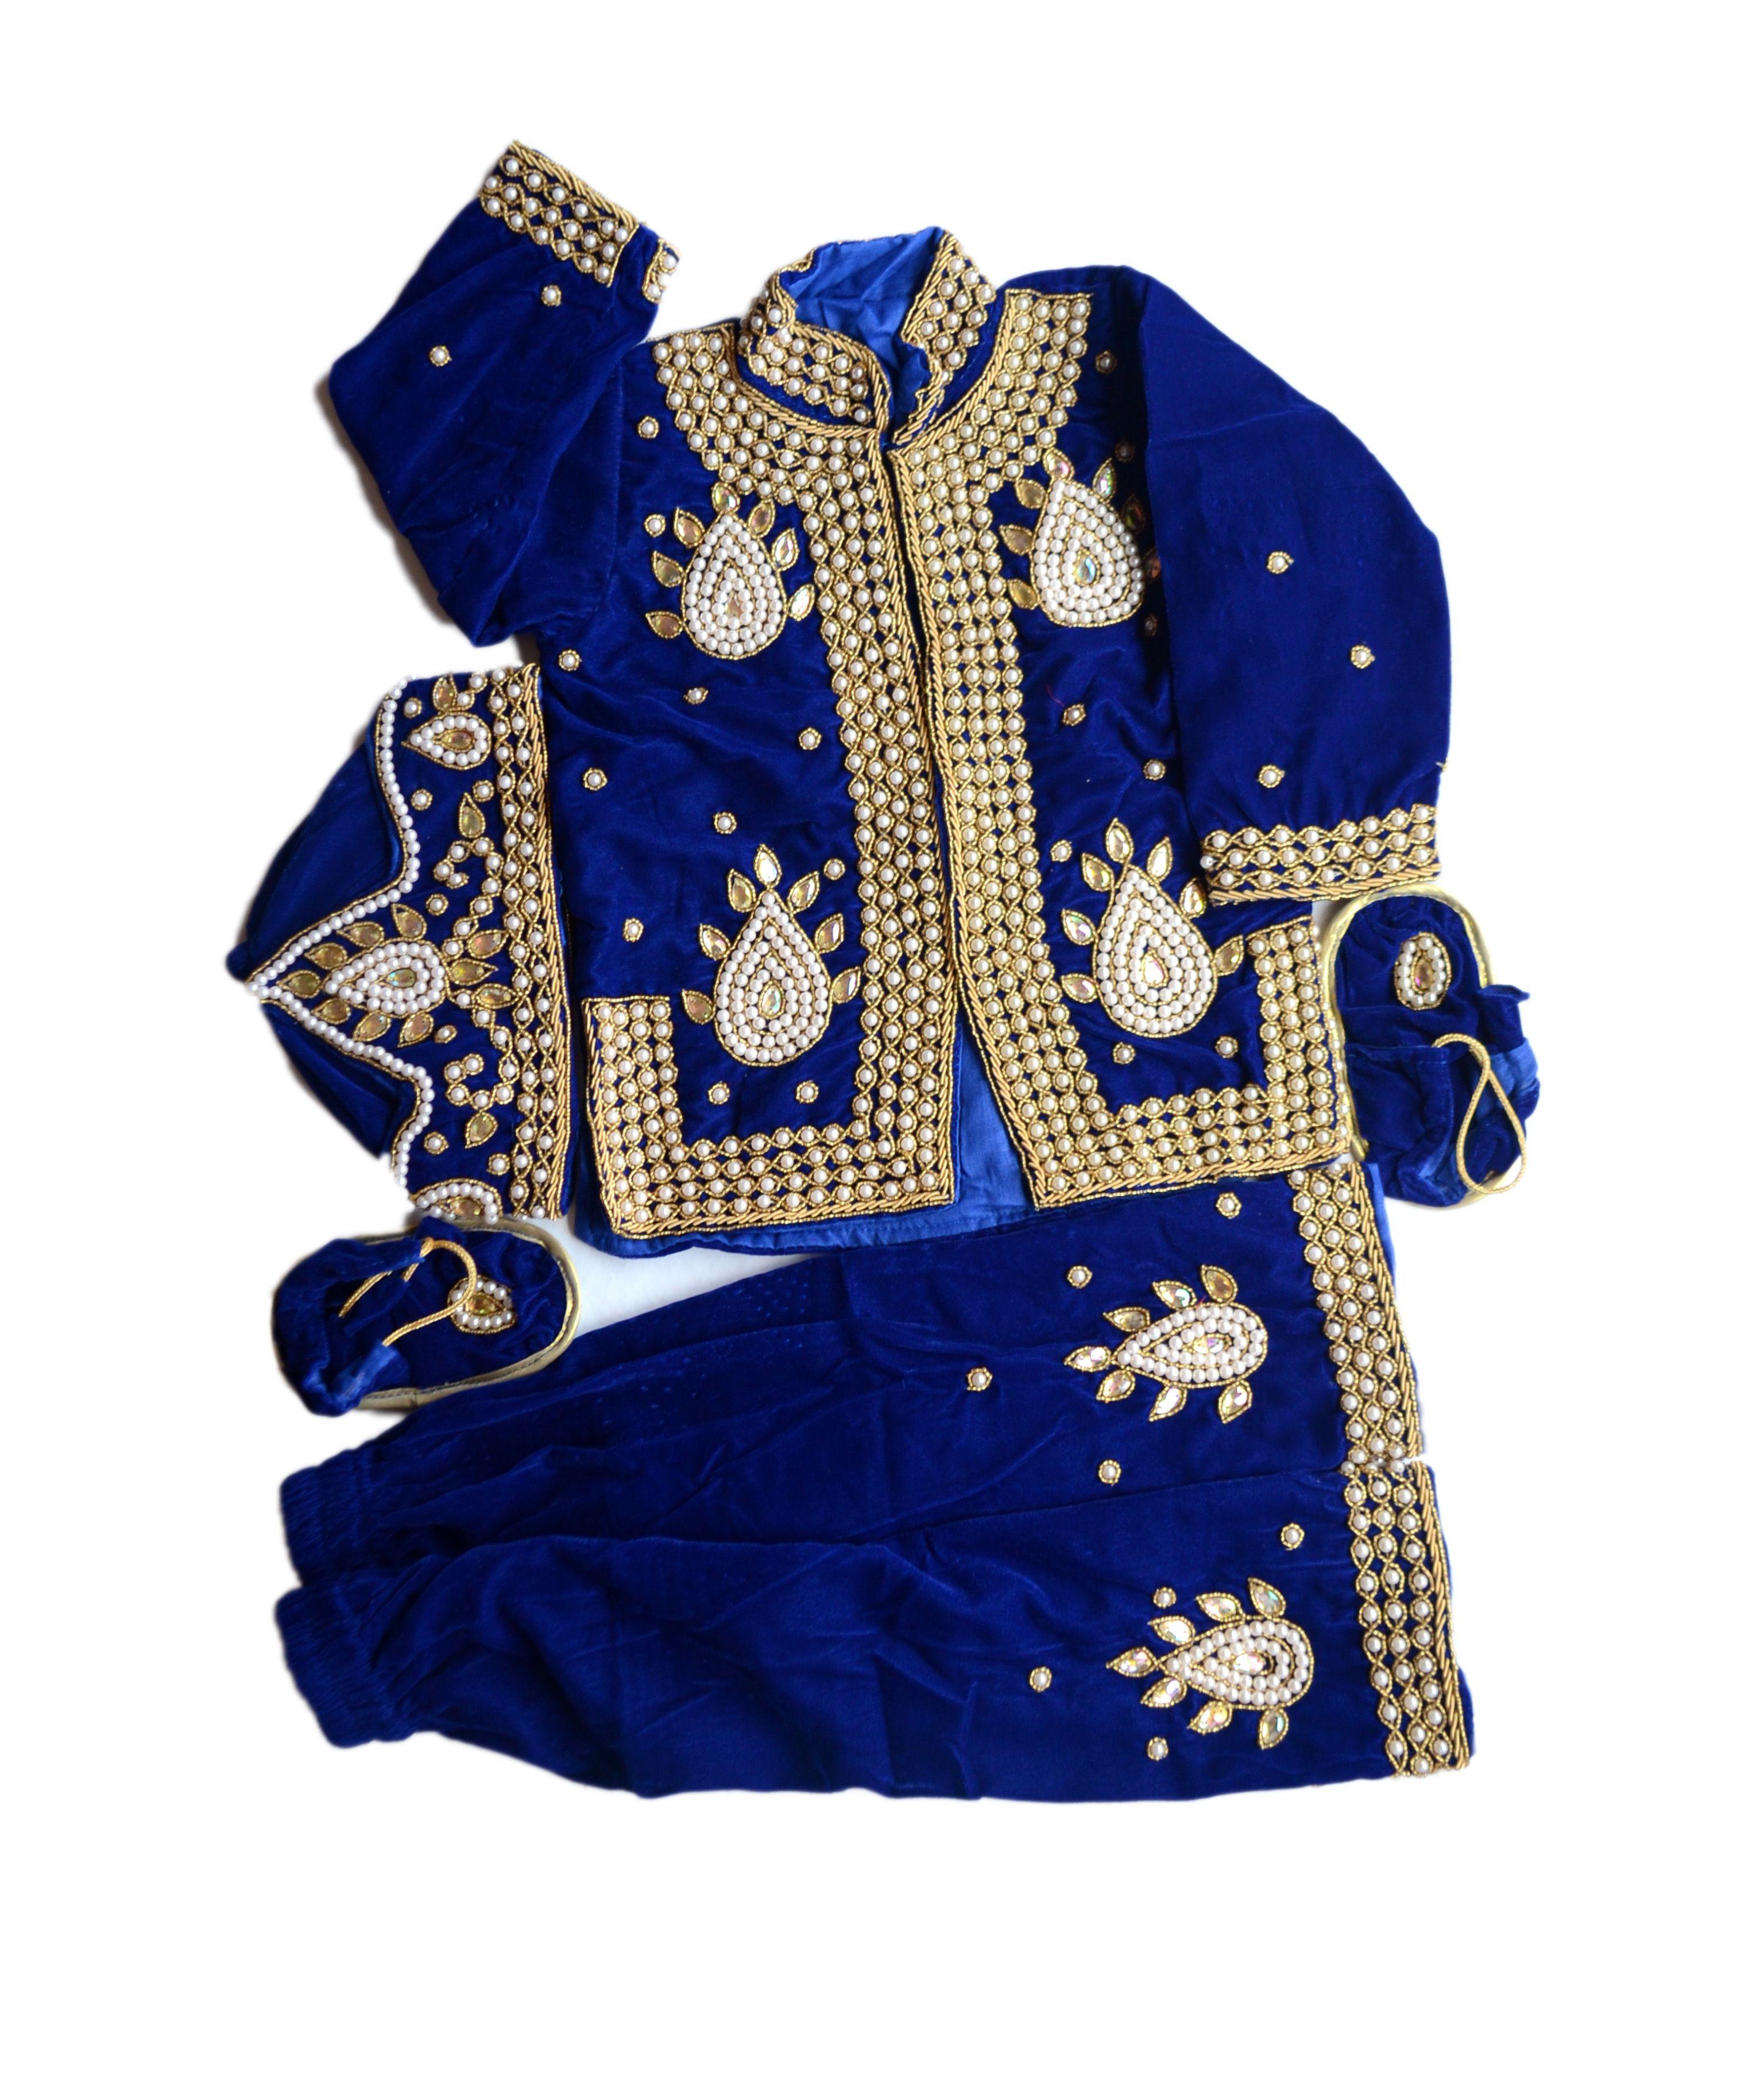 Royal Blue Pasni Set Pasni Dress Nepali Handicrafts In United